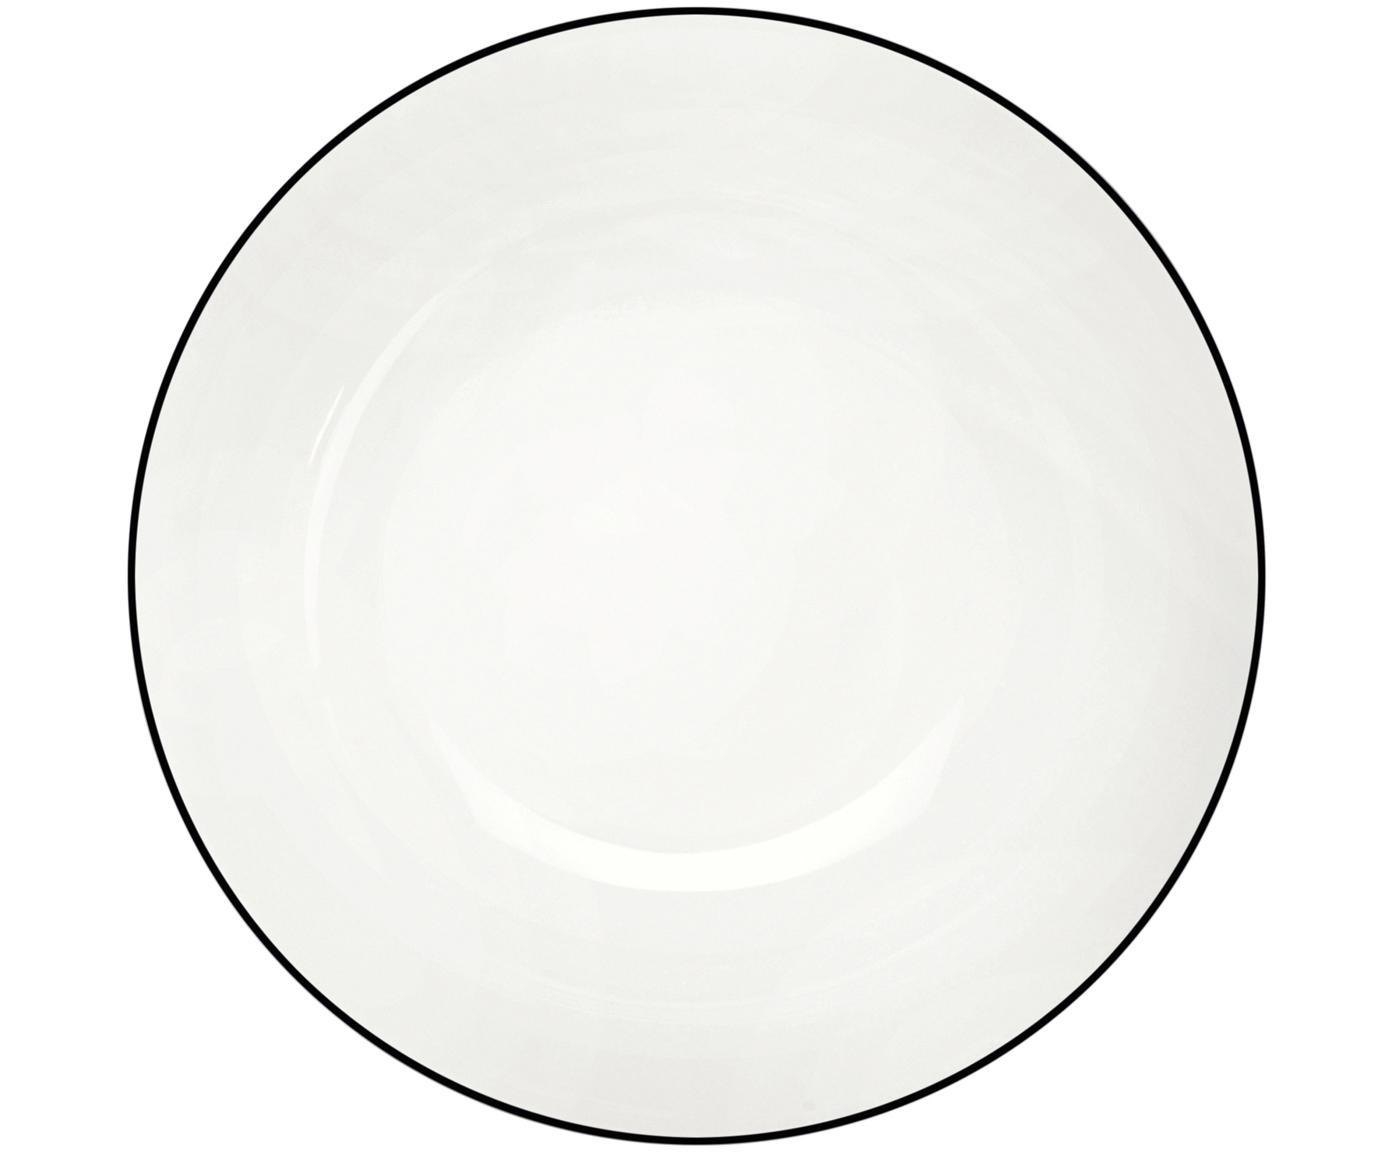 Piatto da dessert á table ligne noir 4 pz, Porcellana Fine Bone China, Bianco Bordo: nero, Ø 21 cm